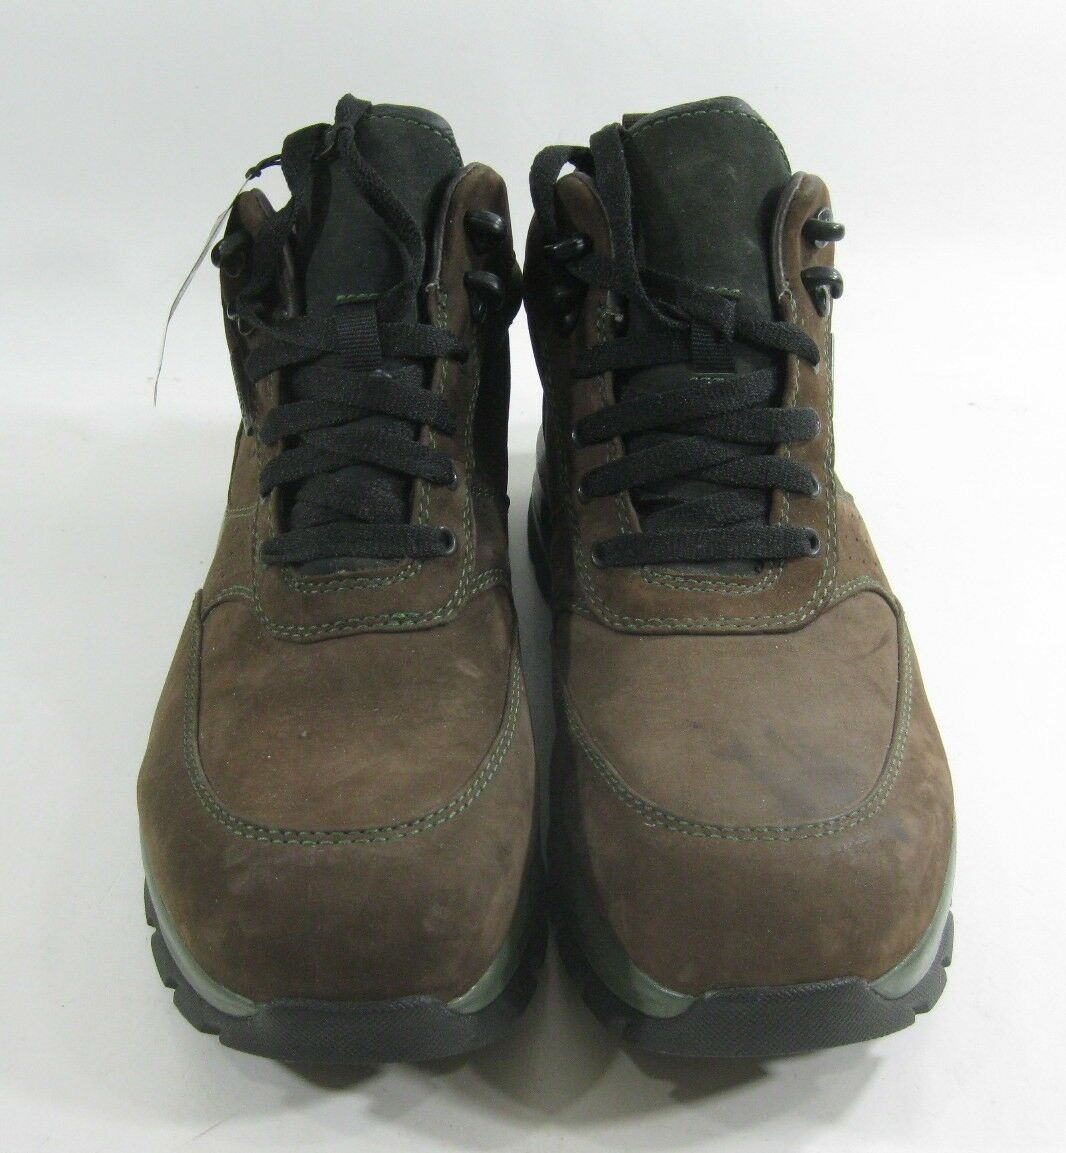 314347-231 nike air goadera gtx gtx gtx Uomo scarpe marrone verde taglia 9 a36d9a